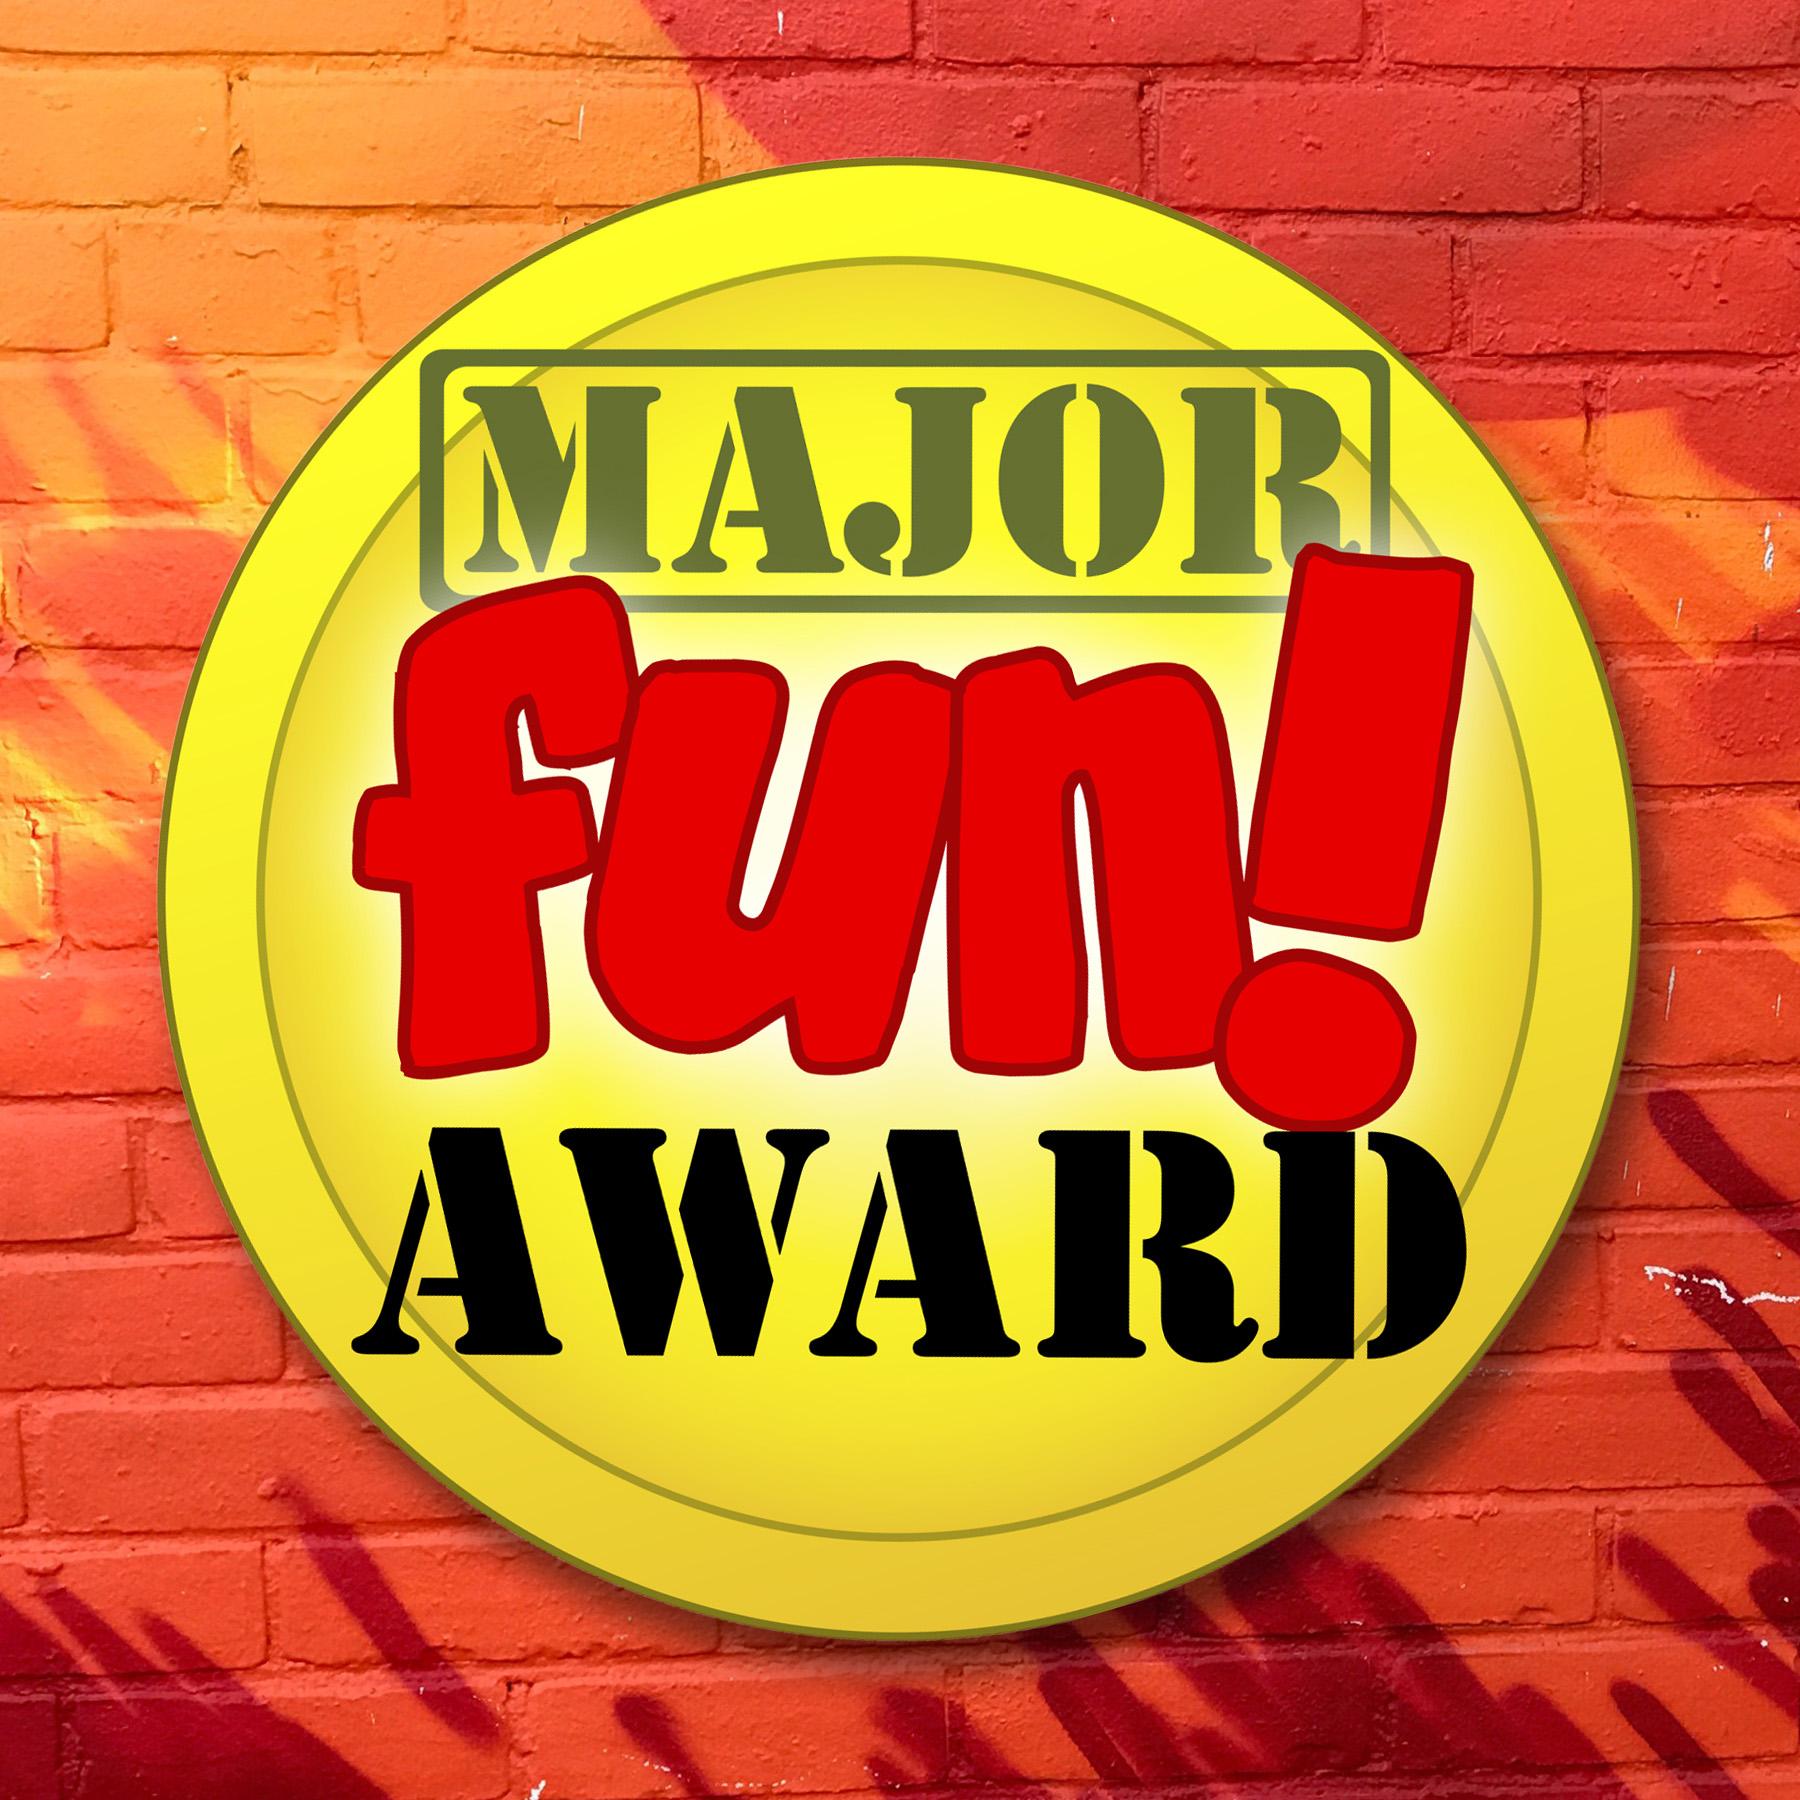 Candygrams-Family-Board-Games-Word-Game-Award-Winning-Gift-Major-Fun-Unsplash.jpg